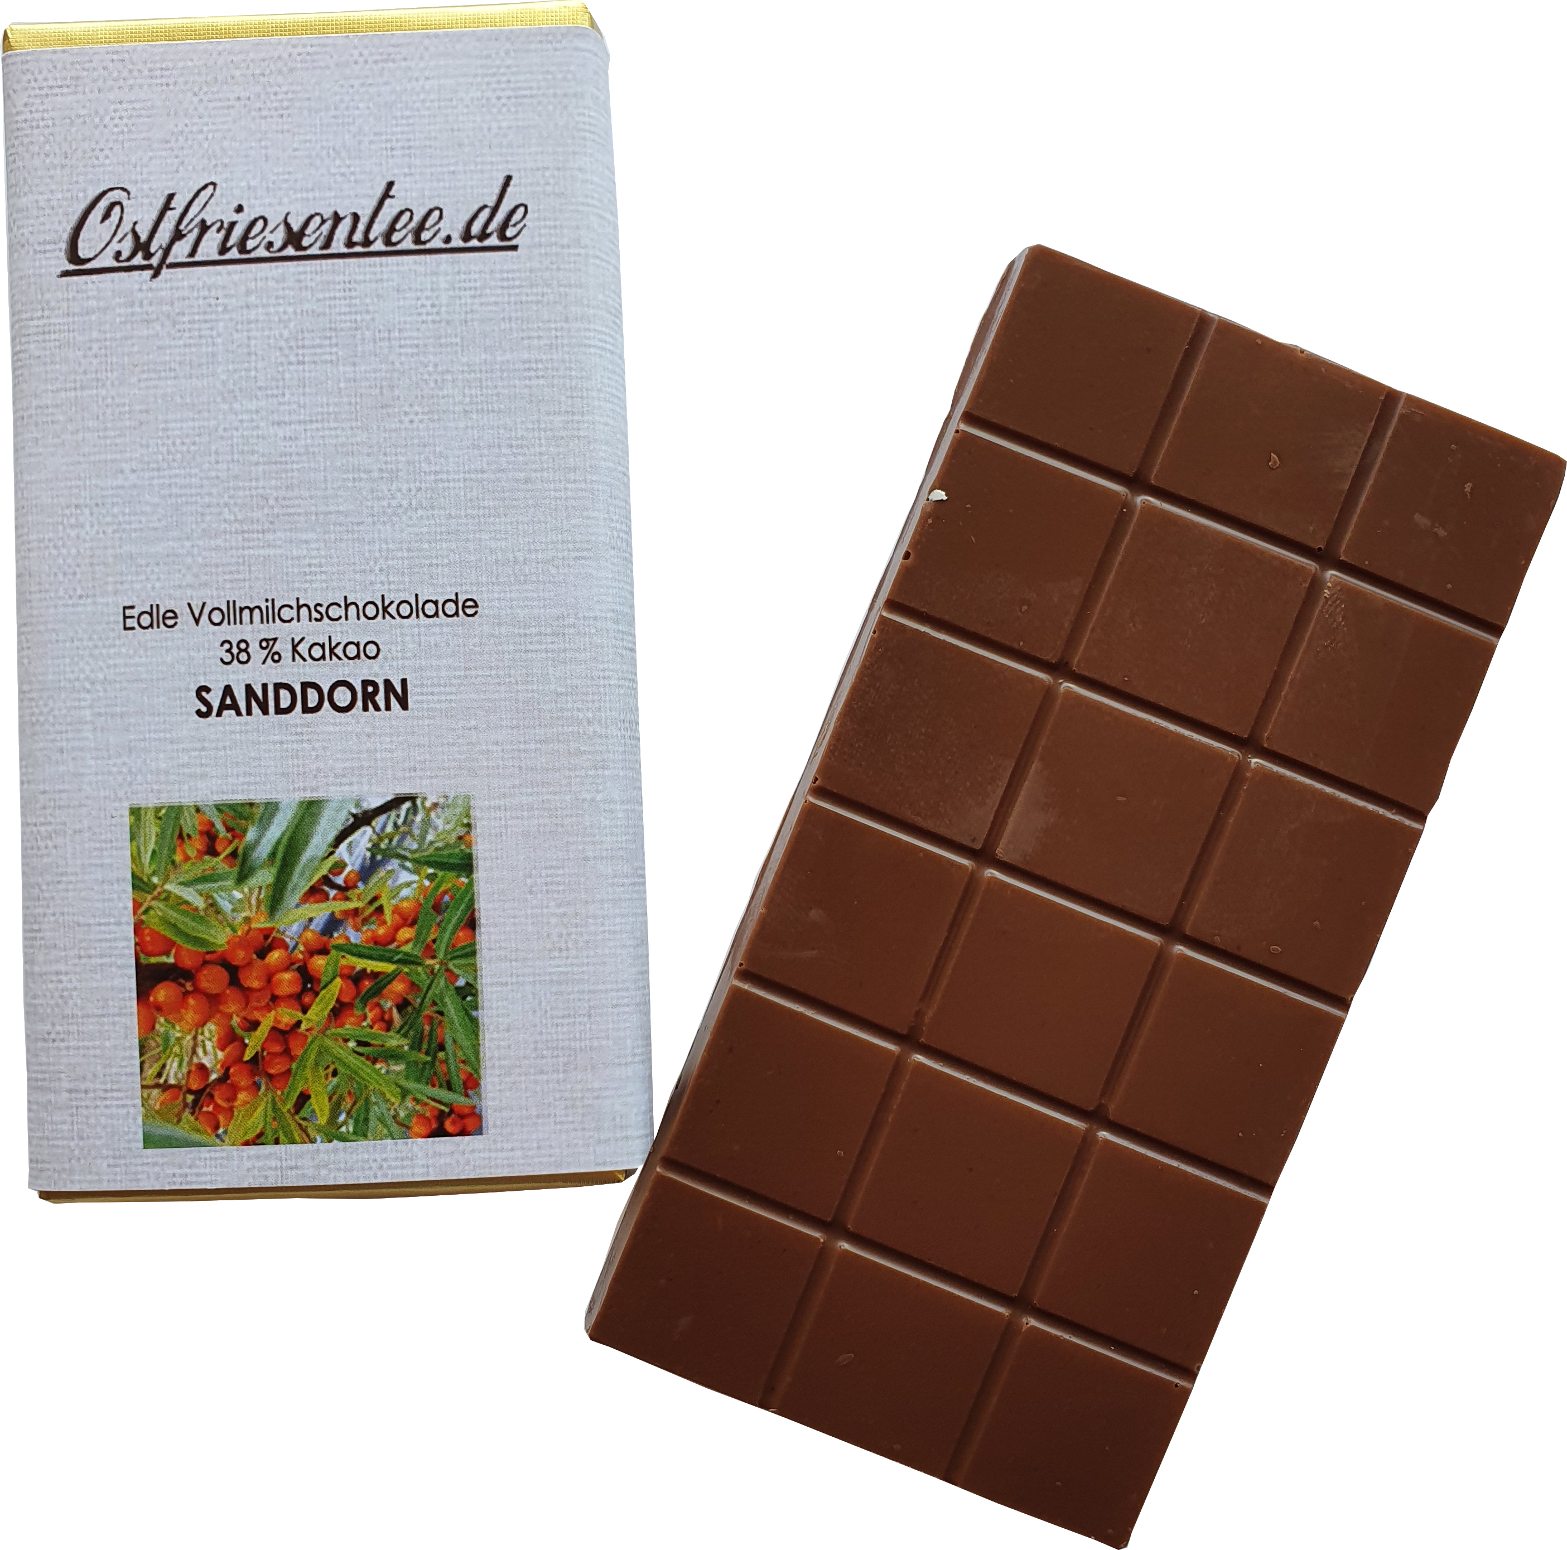 Sanddorn Schokolade